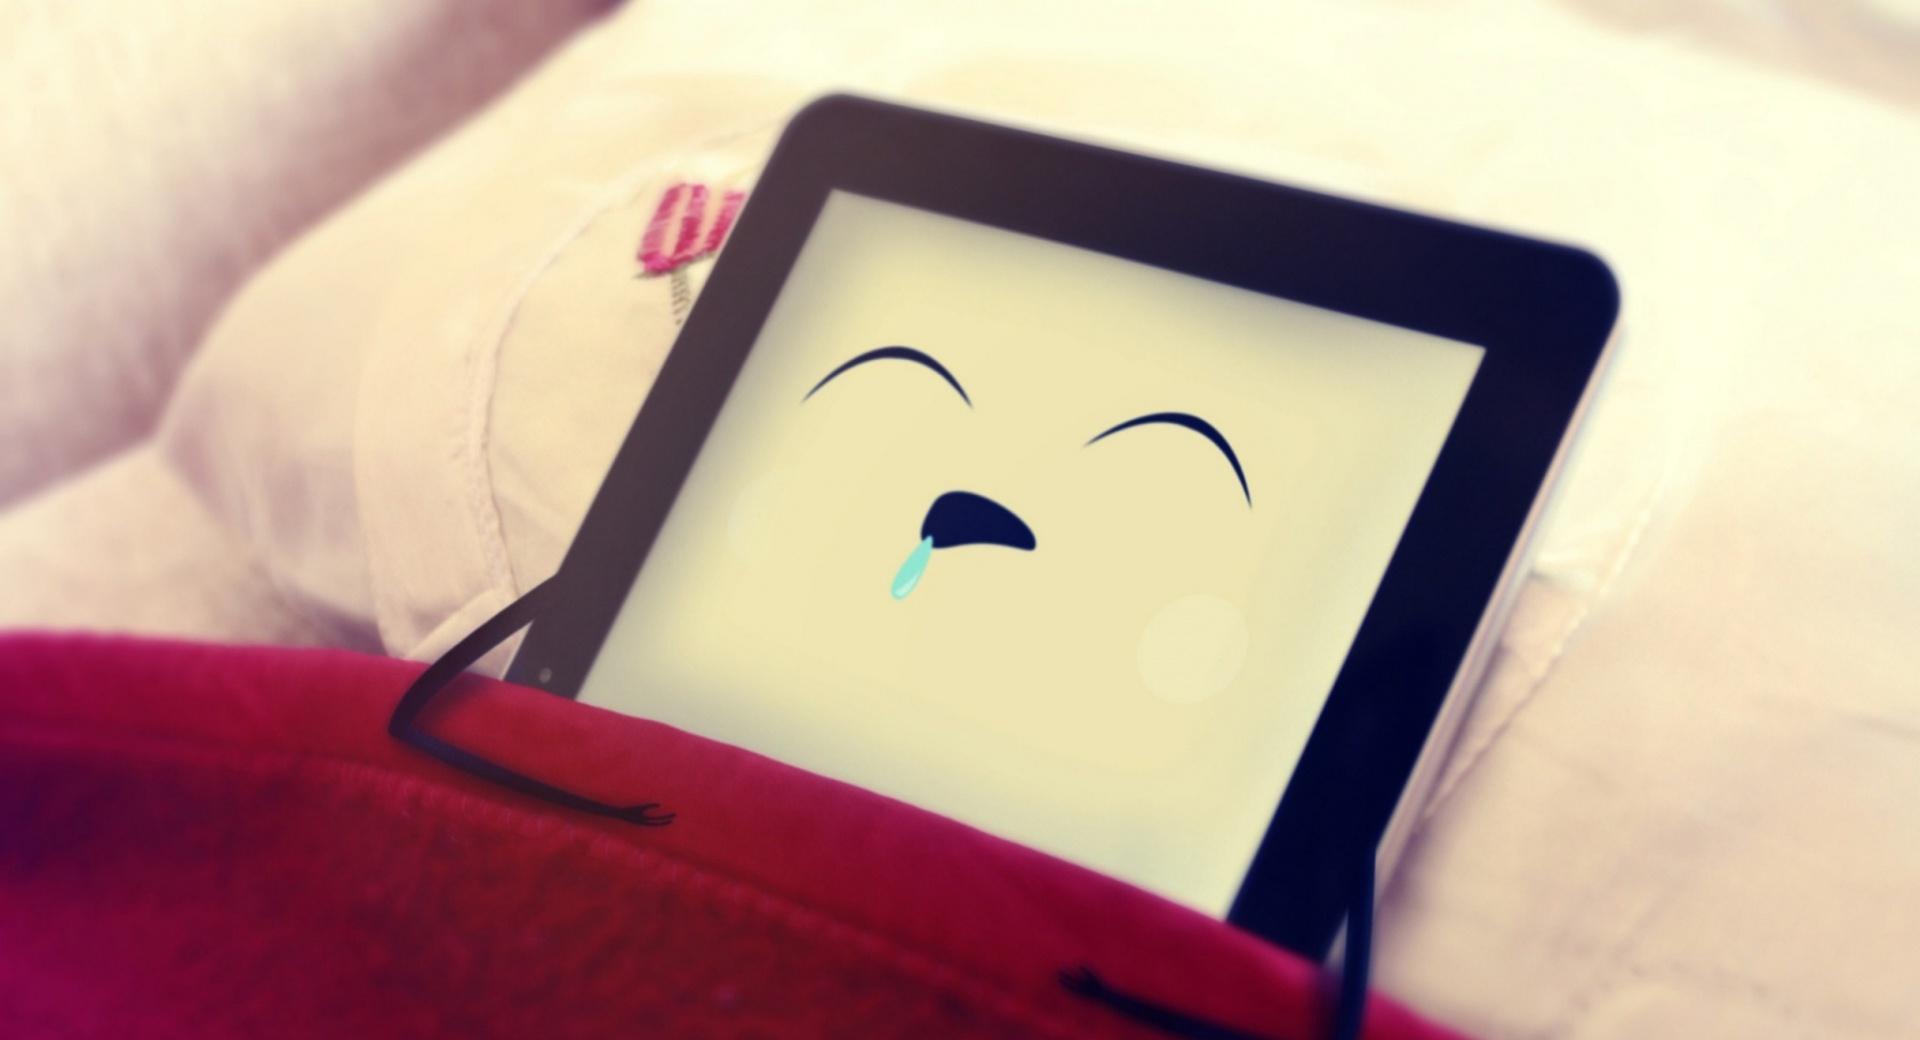 iPad Sleeps wallpapers HD quality